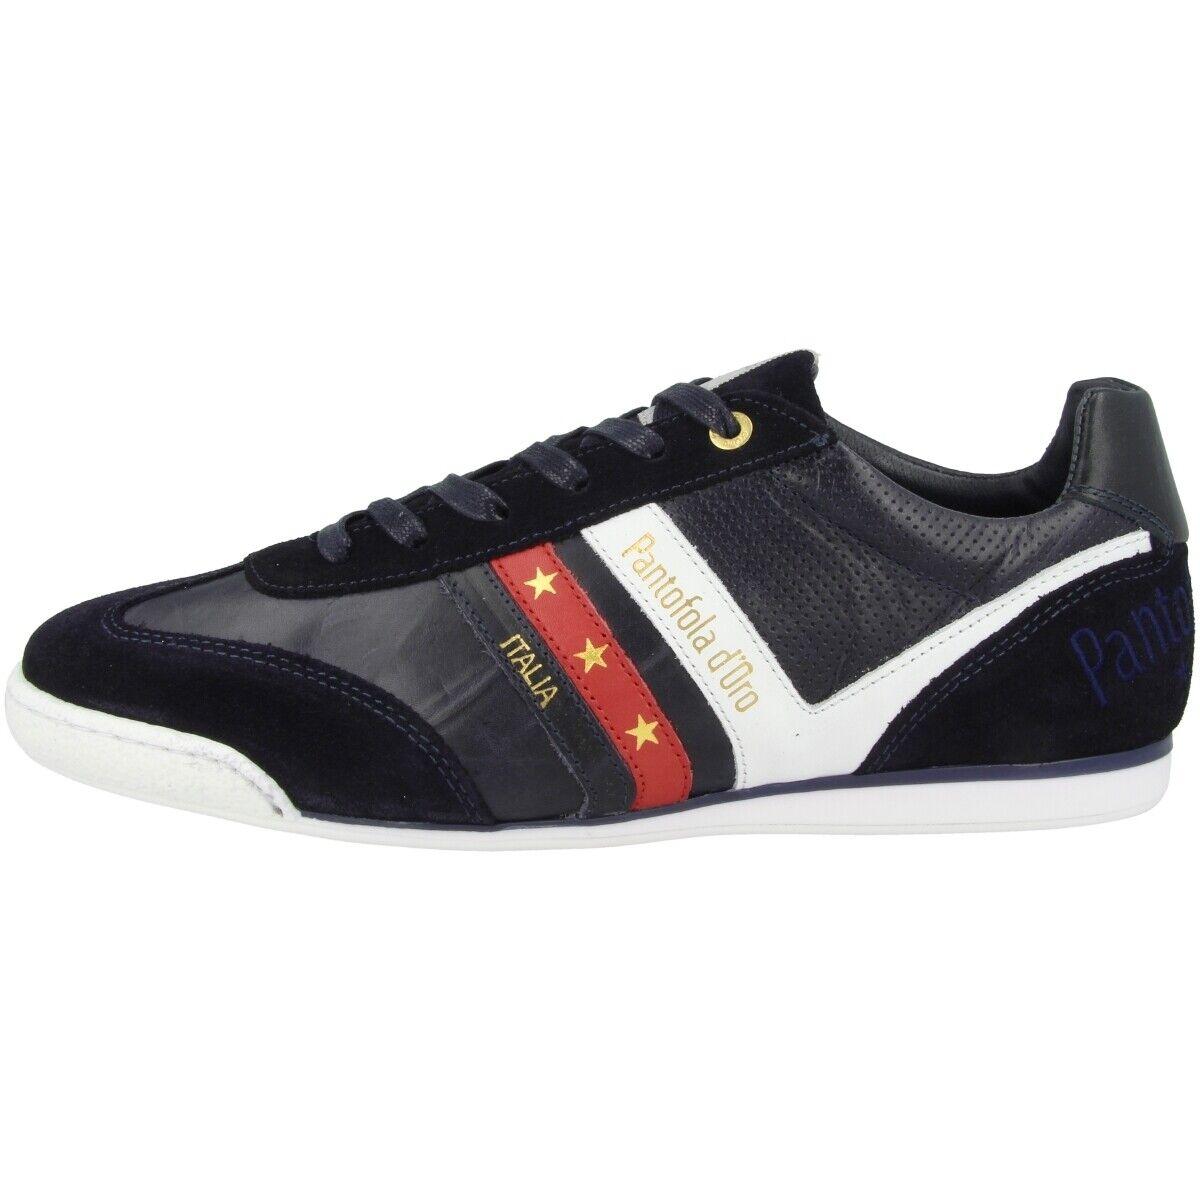 Pantofola d Gold Vasto herren Low Loreto Schuhe Herren Turnschuhe Blaus 10201045.29Y